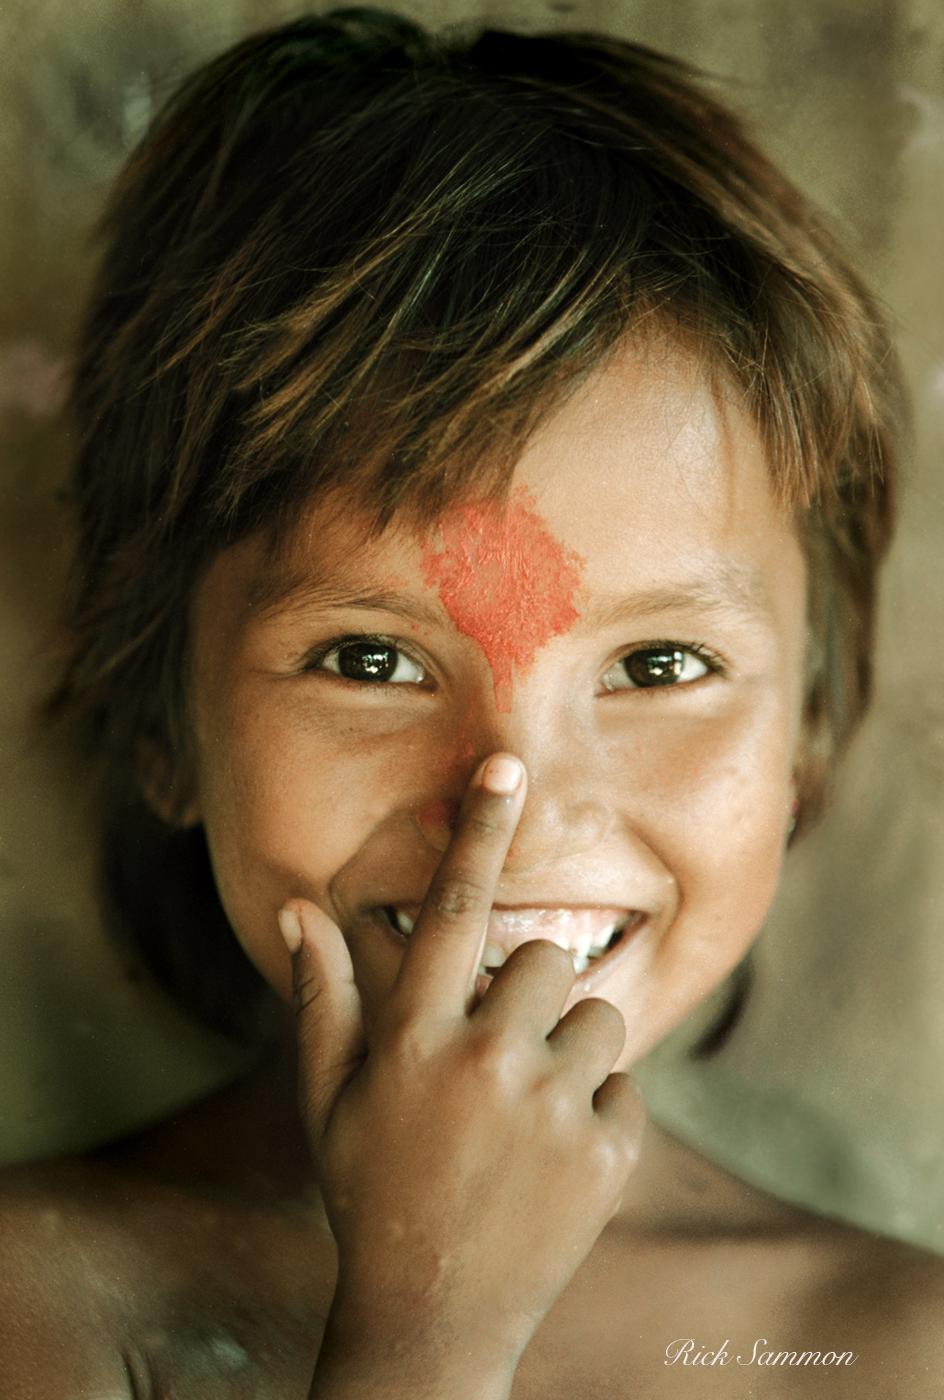 Rick Sammon Nepal.jpg